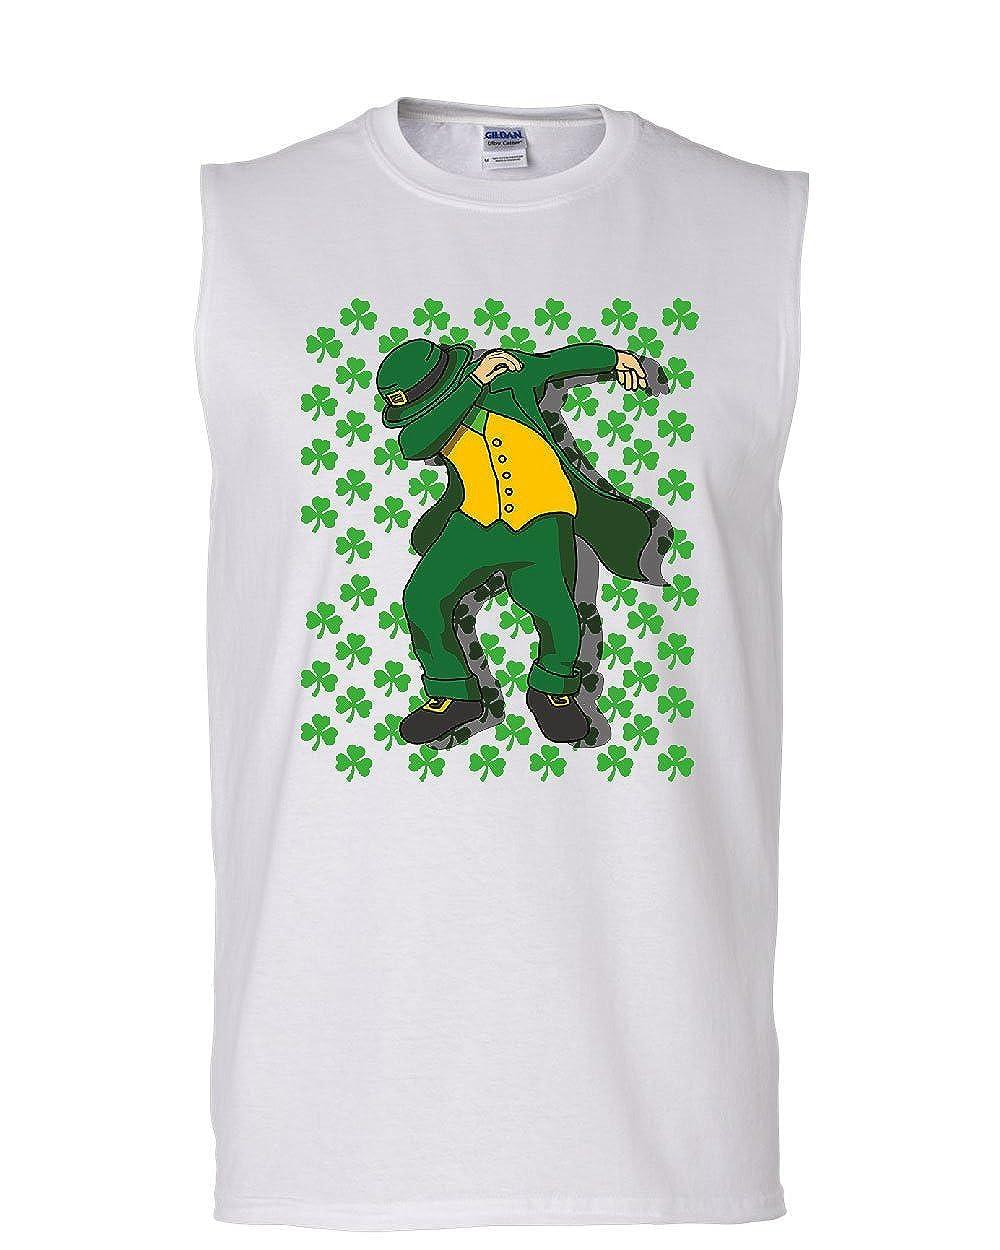 Patricks Day DAB Muscle Shirt Shamrock Dancing Leprechaun Beer Sleeveless Tee Hunt ST